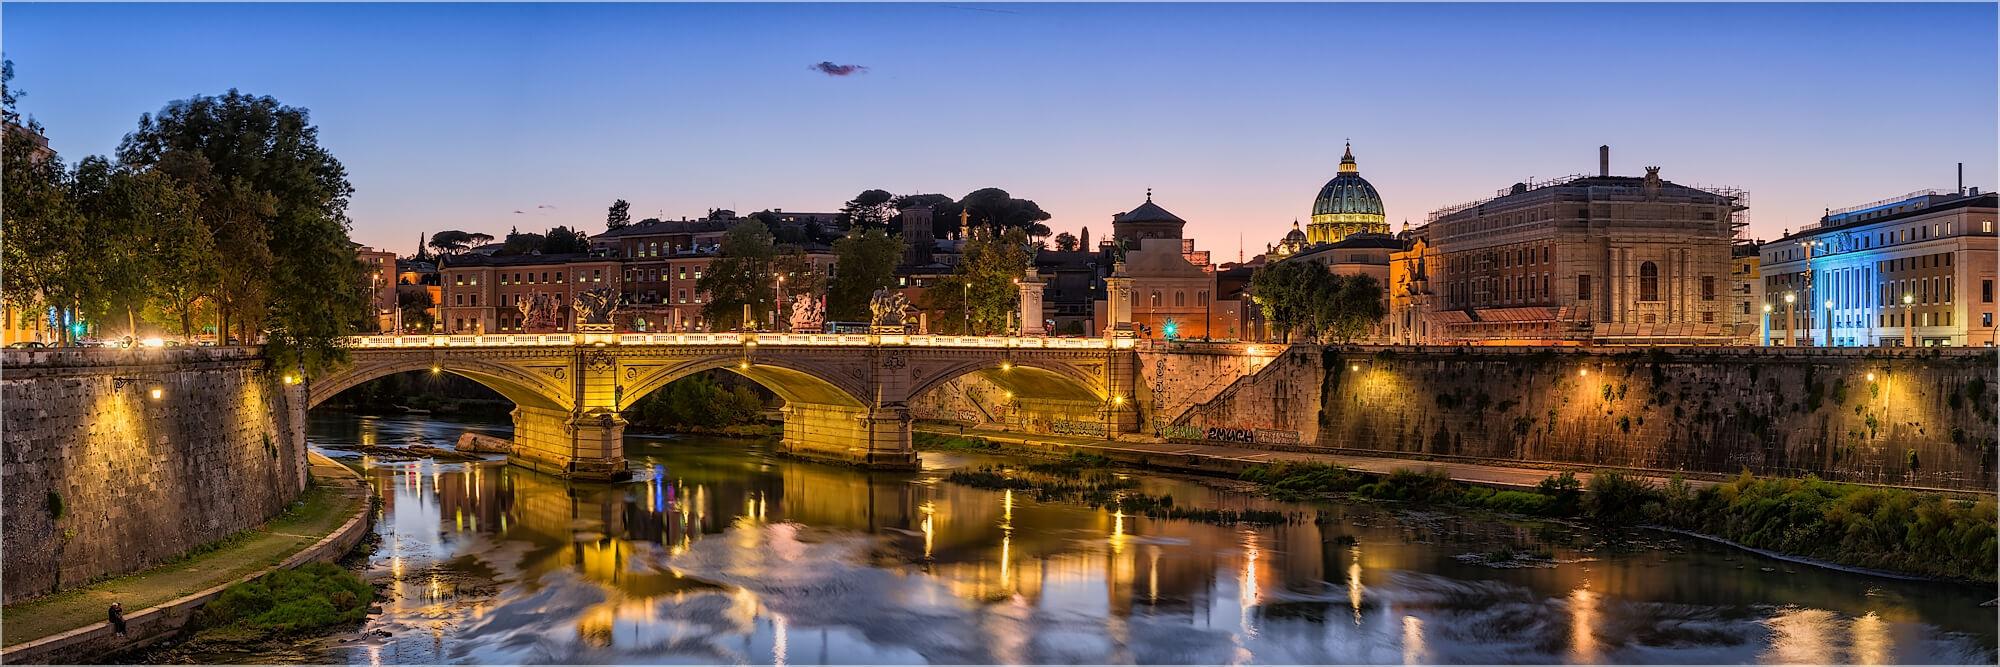 Panoramabild Rom Italien abends am Tiber